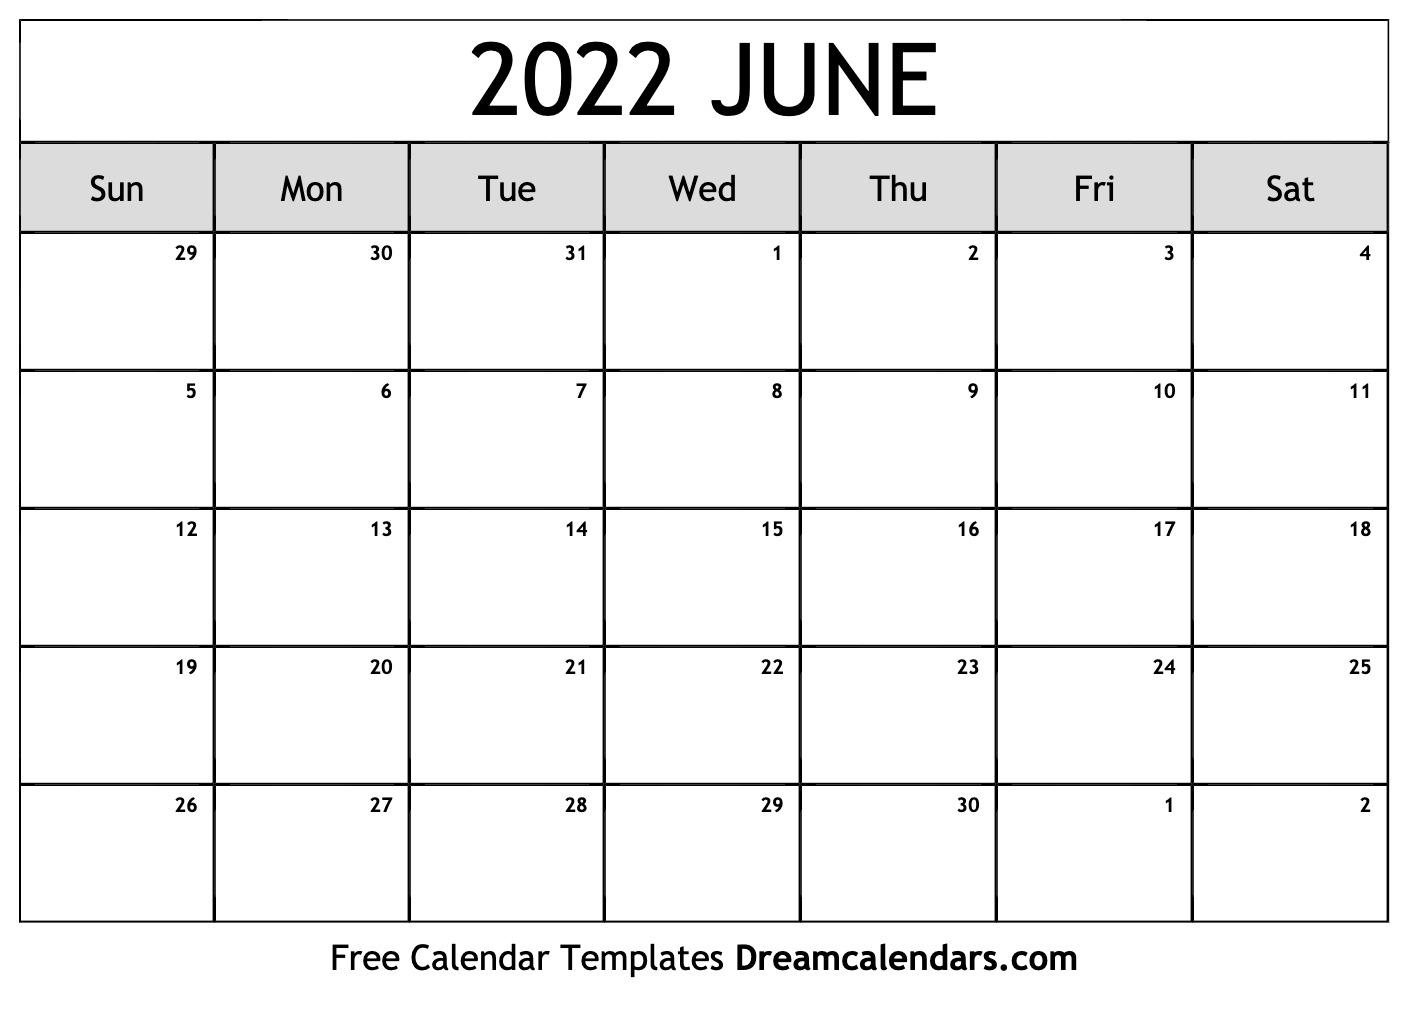 June 2022 Calendar   Free Blank Printable Templates For March April May June Calendar 2022